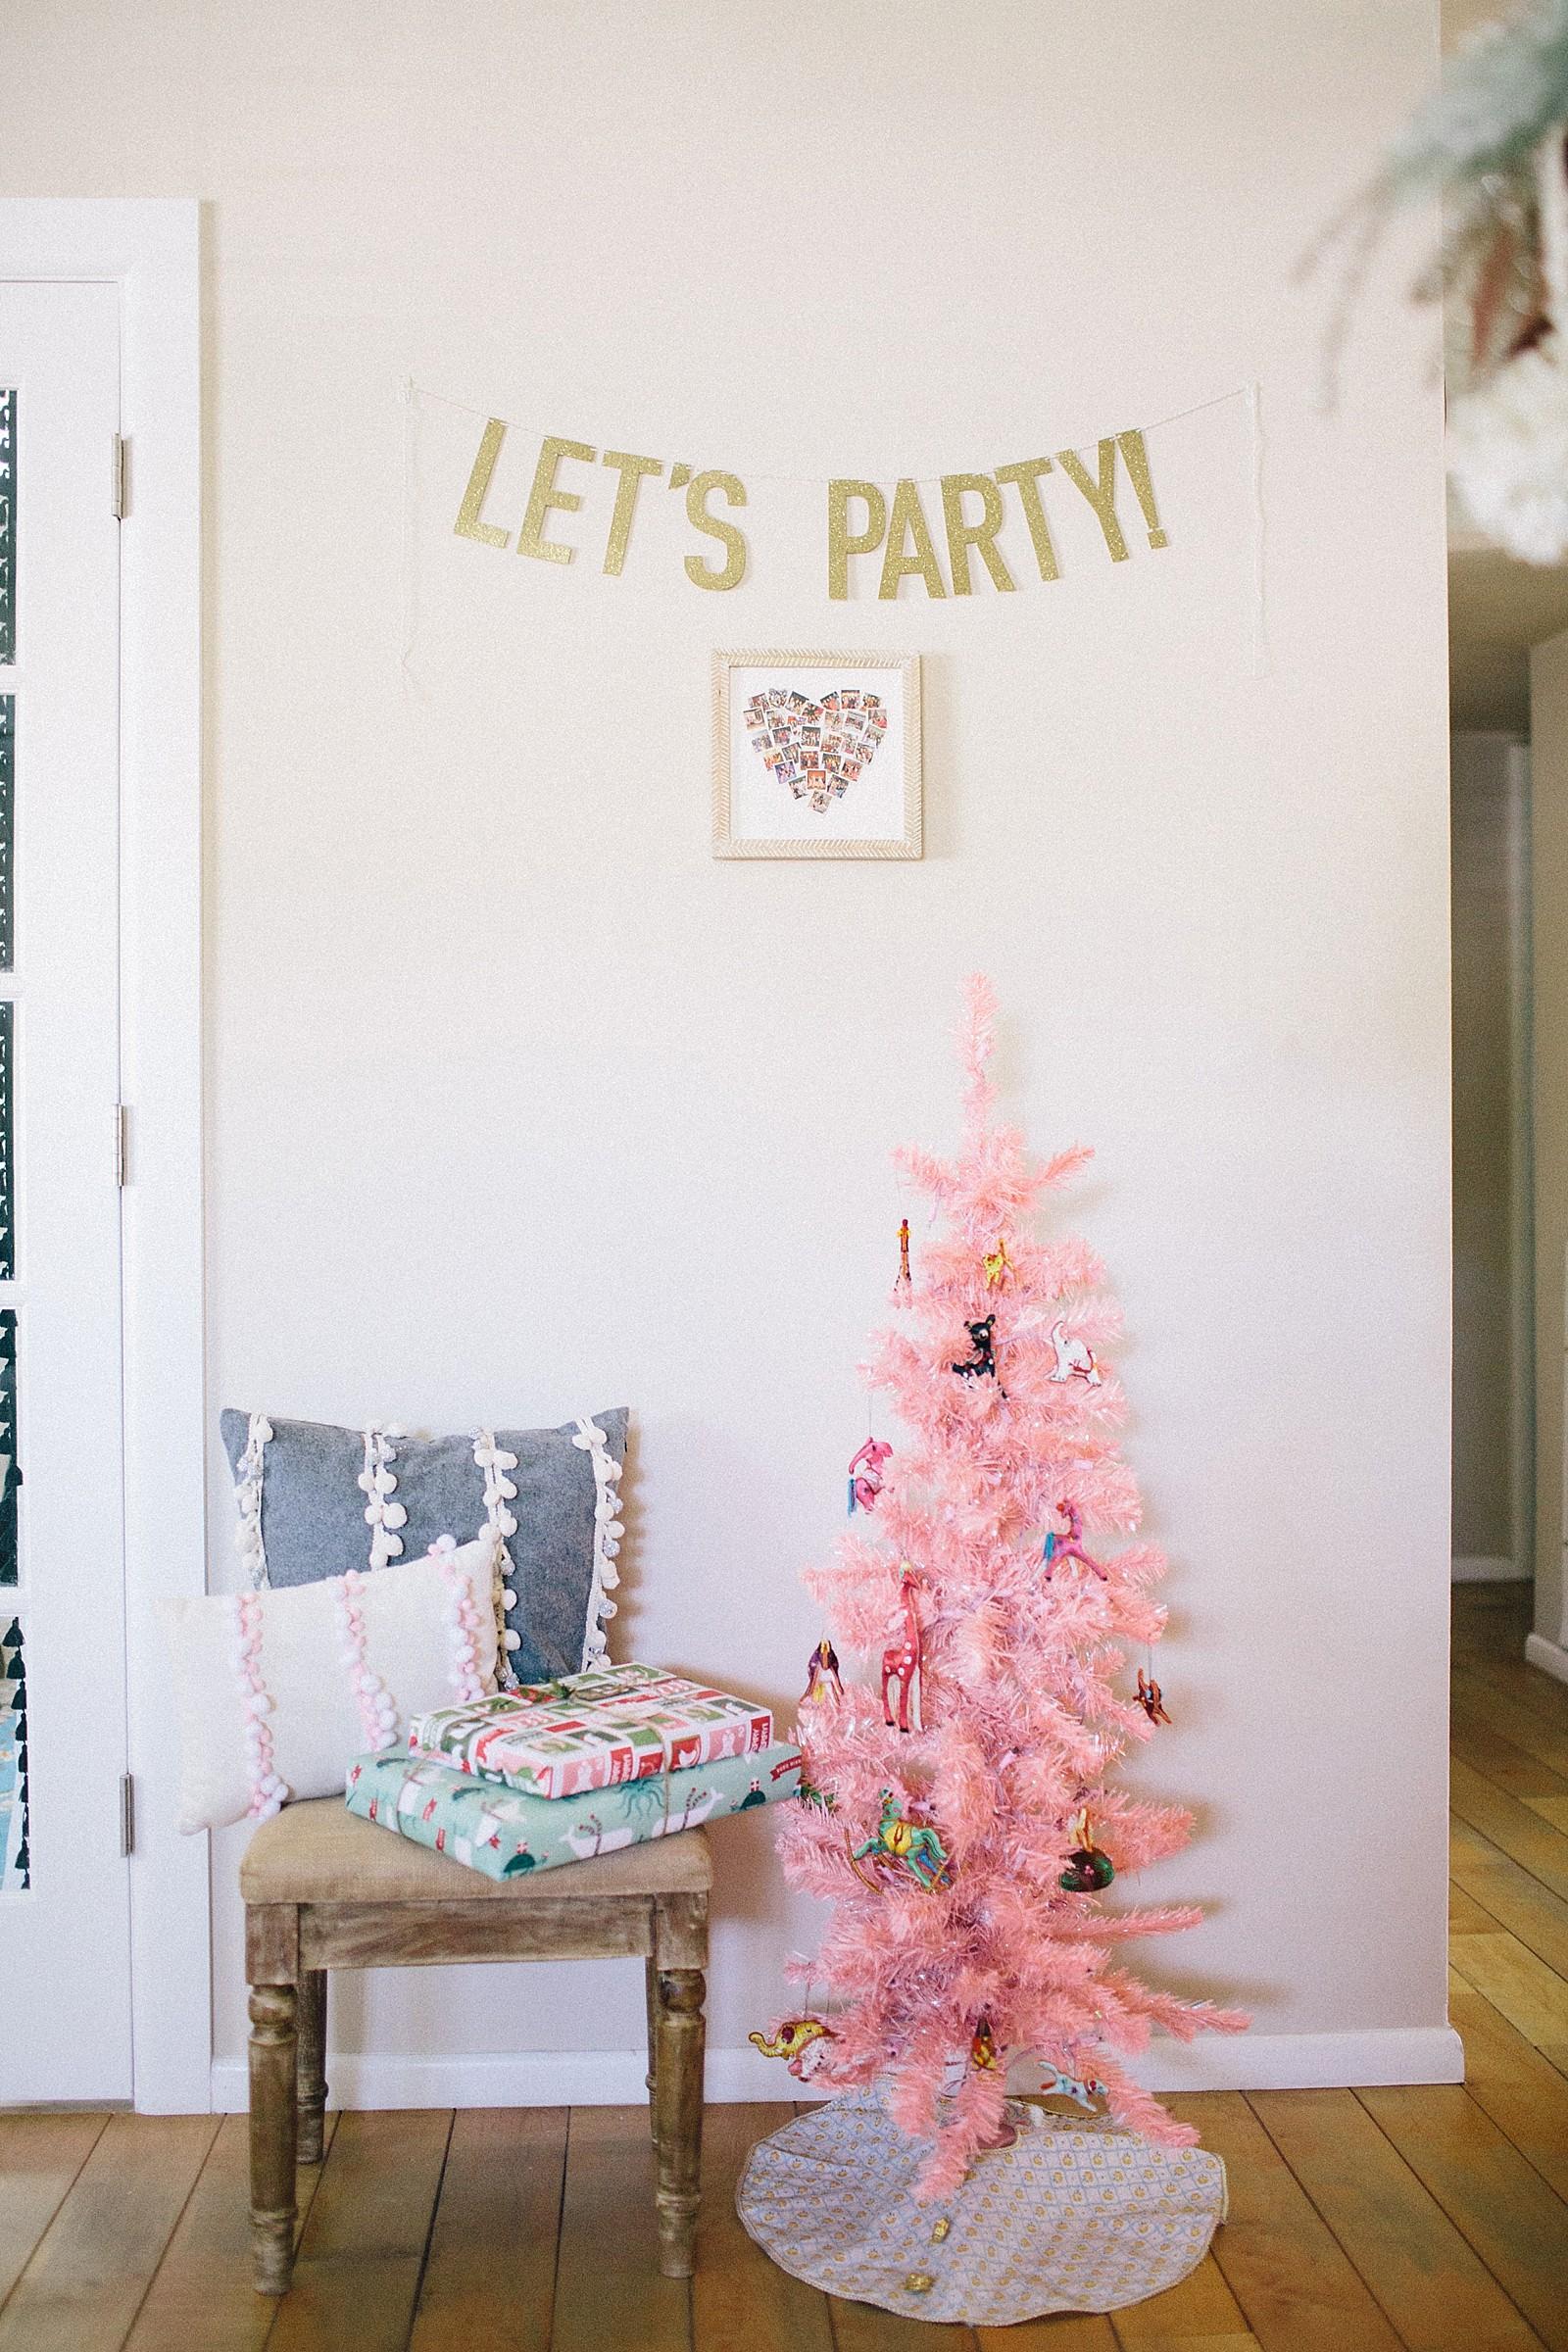 minted-christmas-inspiration-girls-party-photos-diana-elizabeth-blog-lifestyle-hostess-entertainment-home-blog-2312